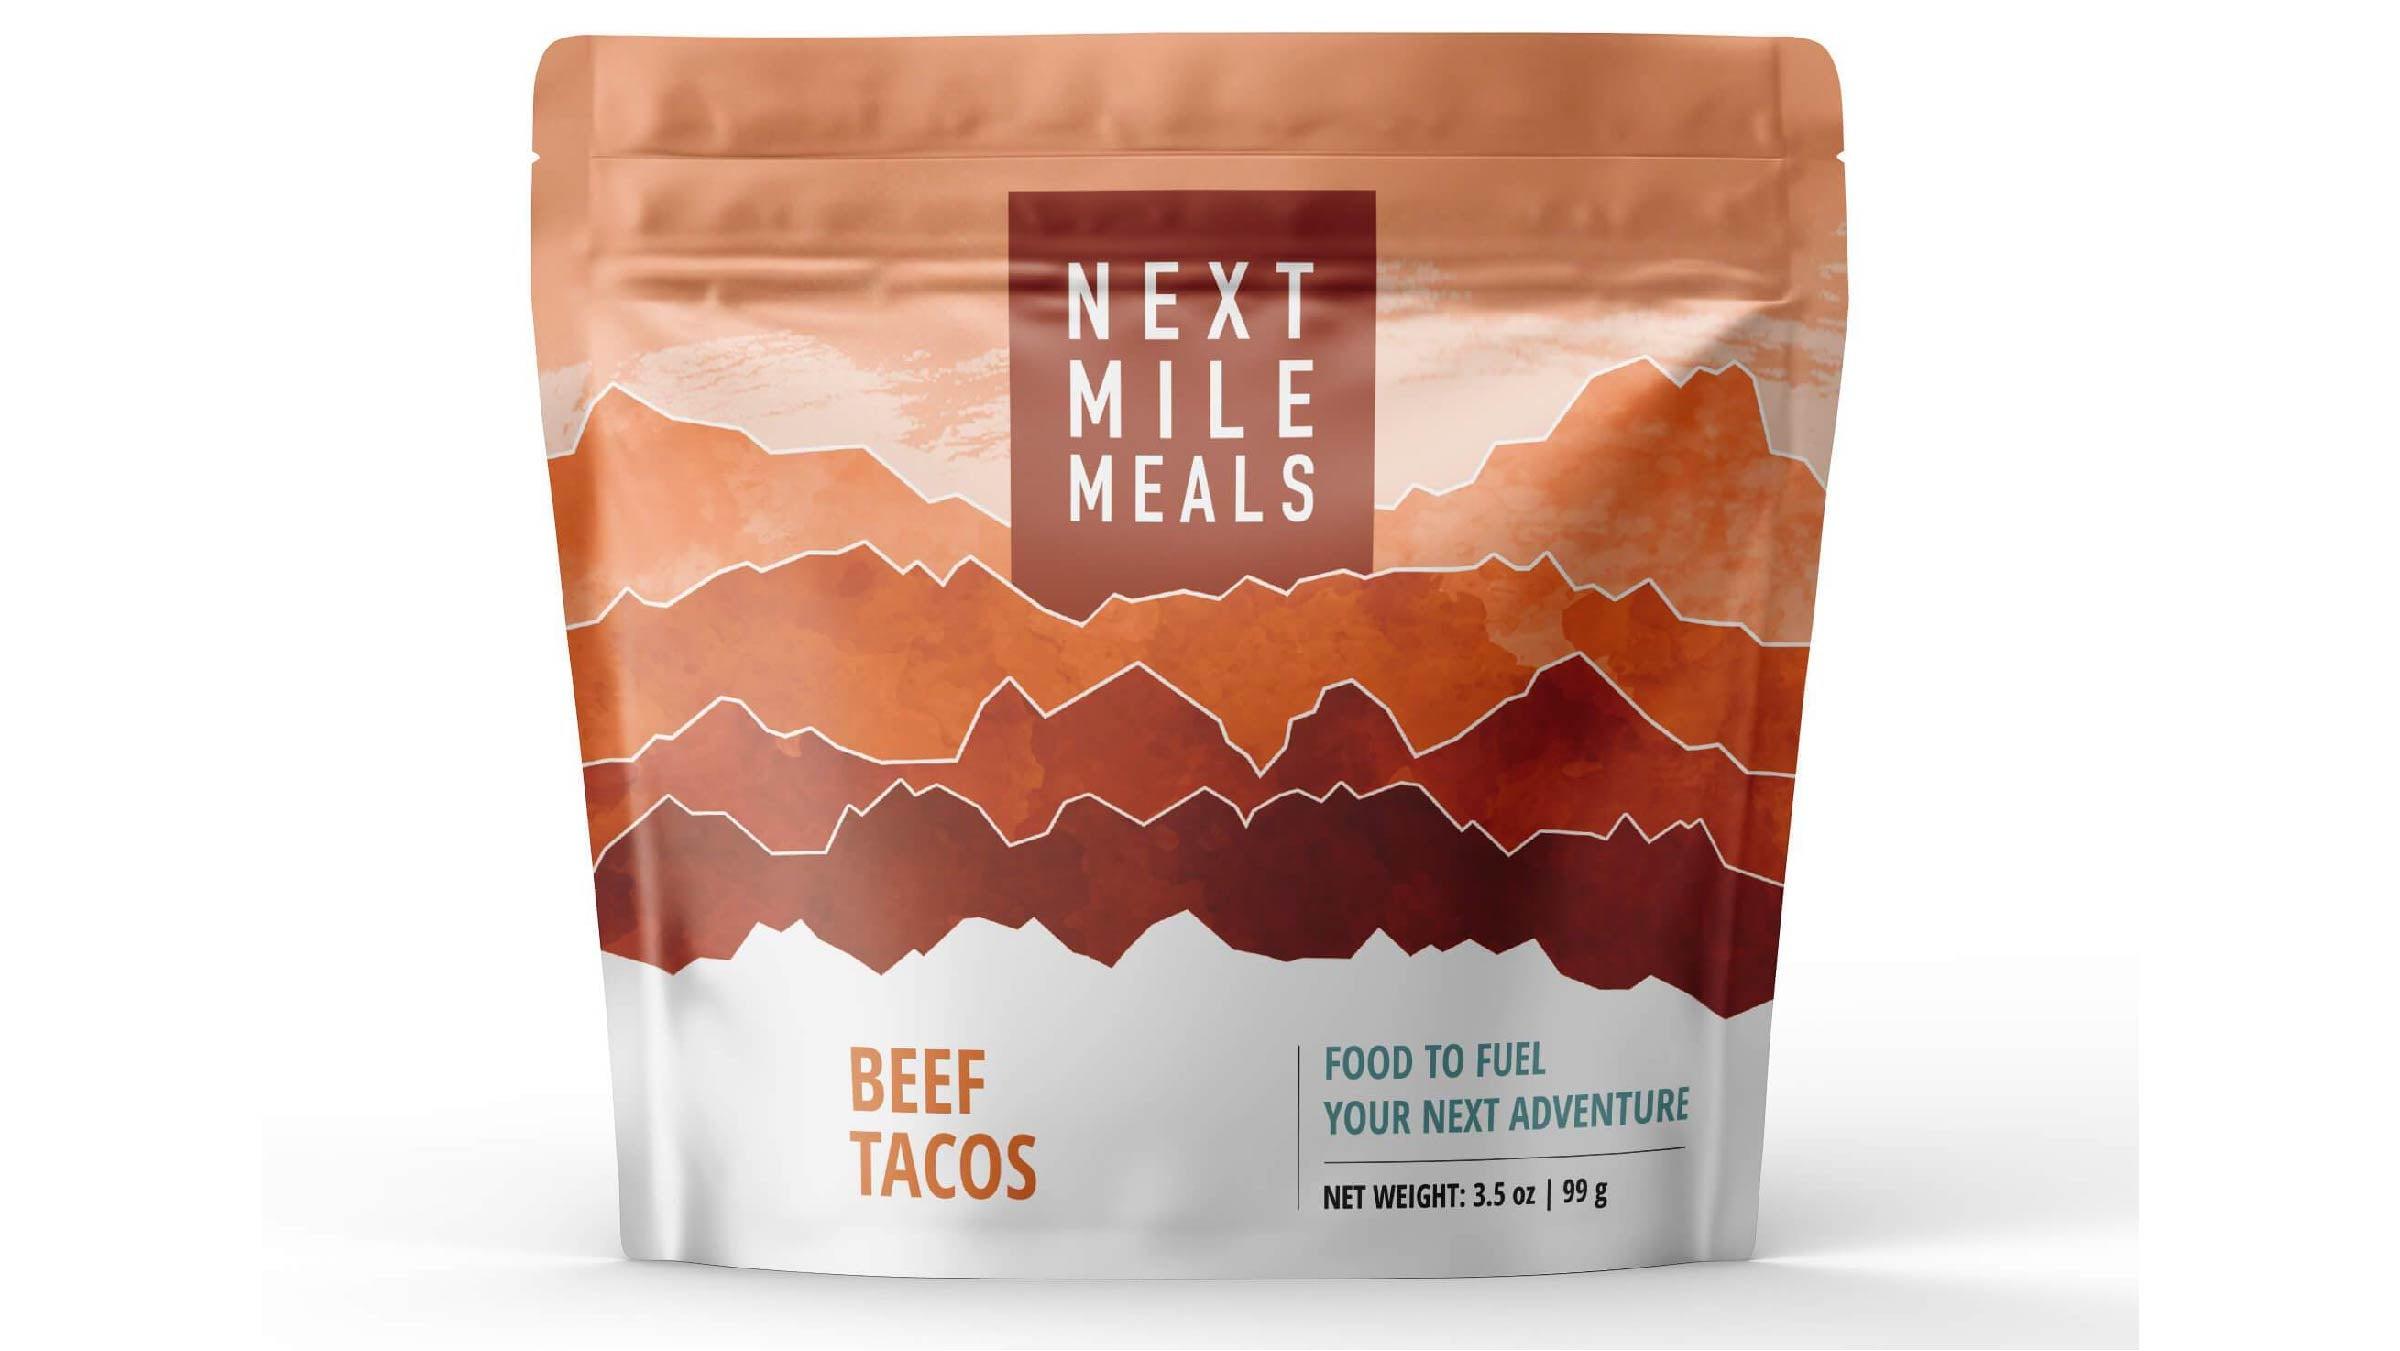 Next Mile Meals Beef Tacos